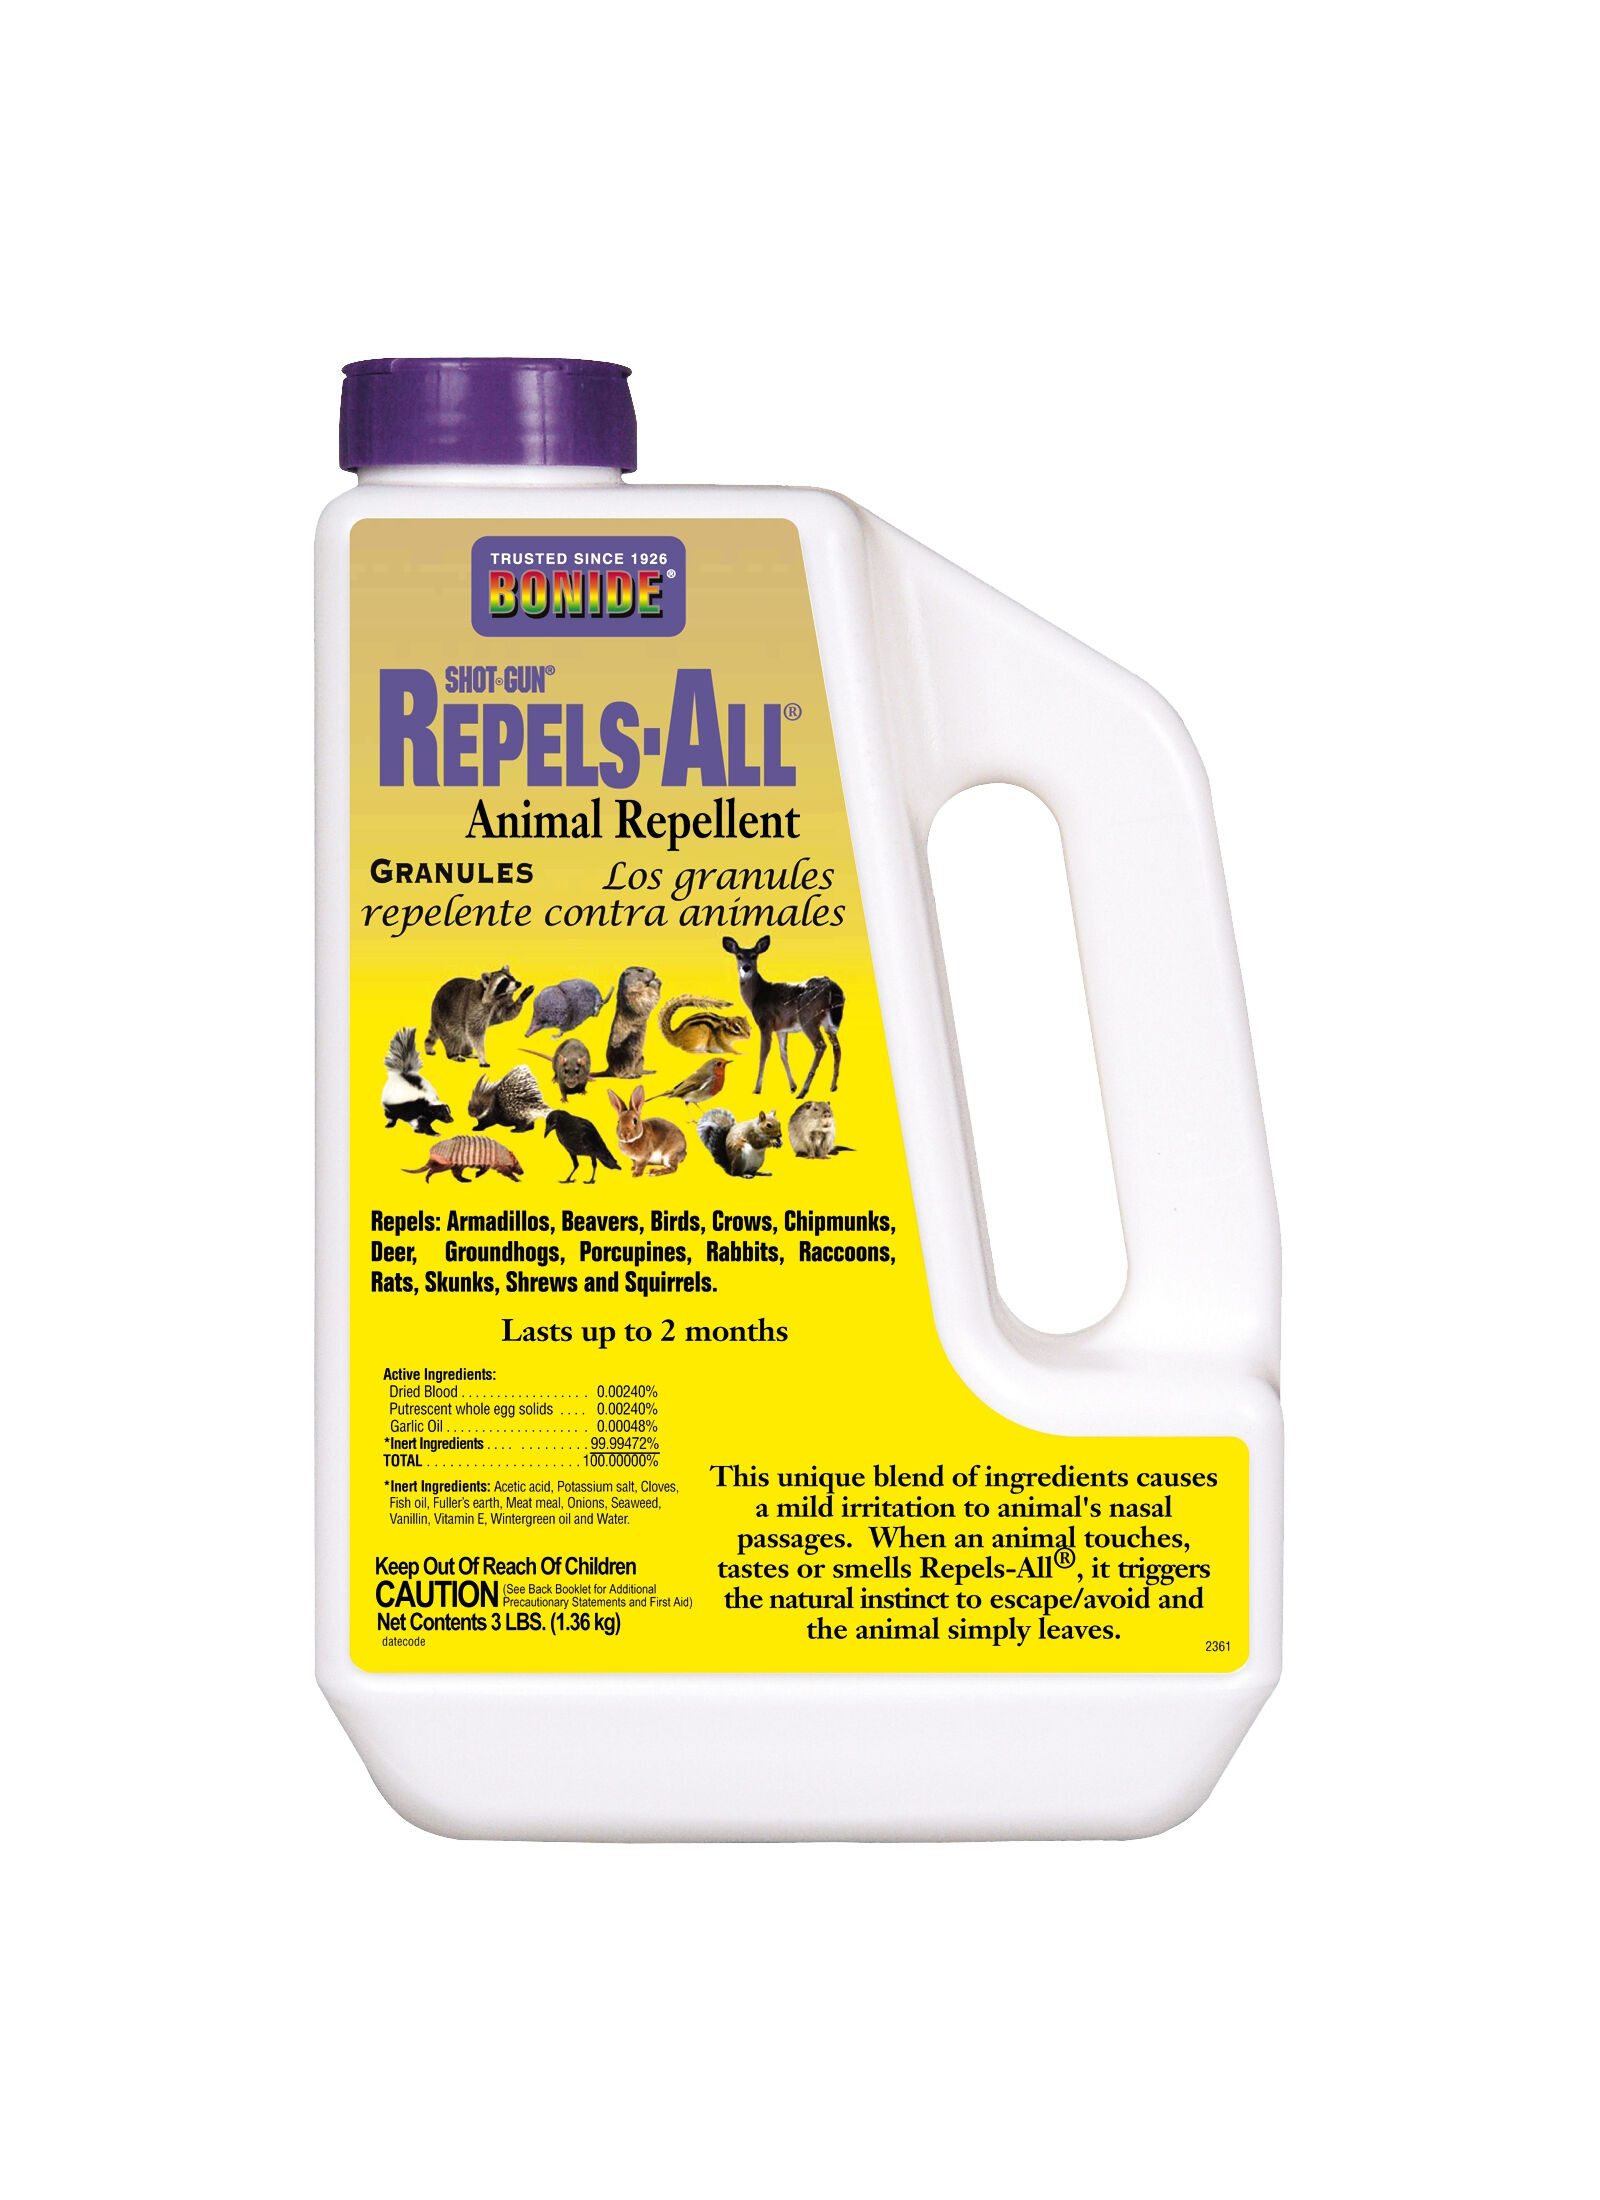 Portable Mosquito Repeller with Geranium Oil | Gardeners com